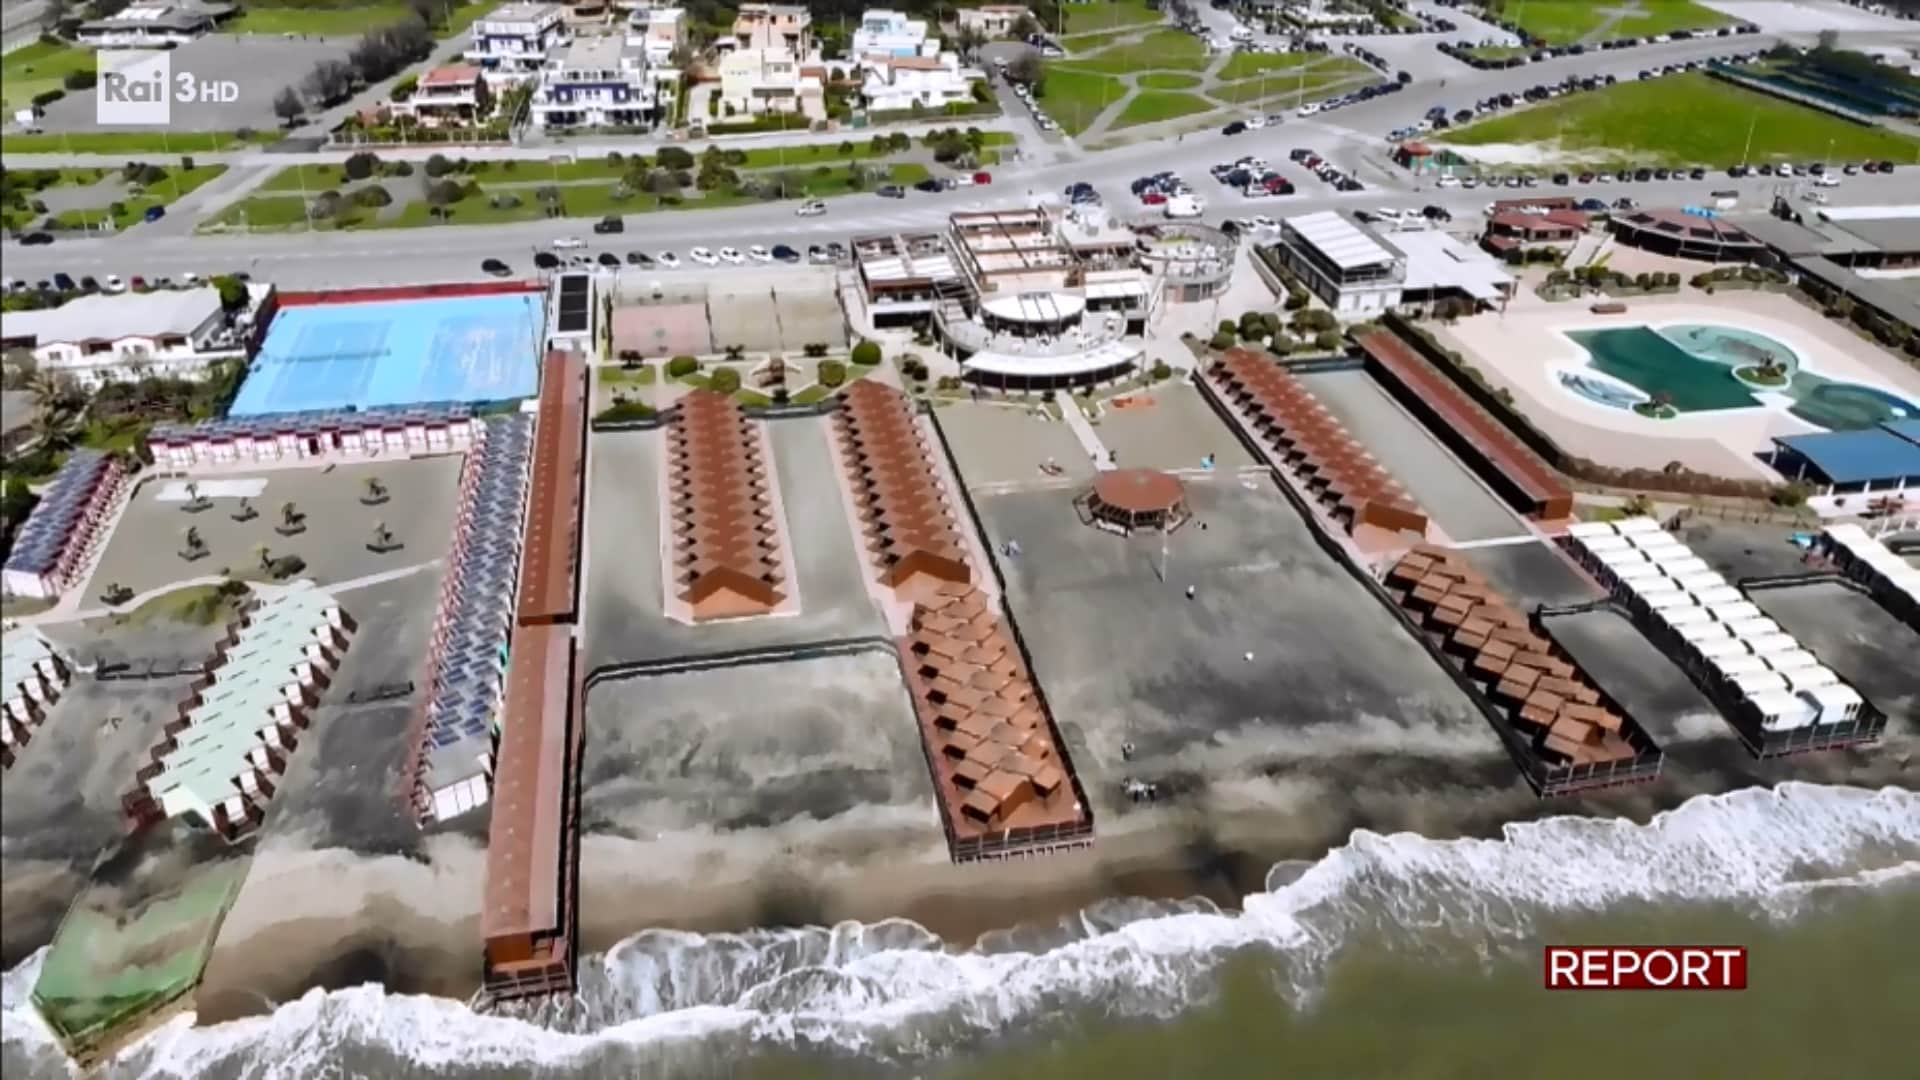 report ostia balneari libera spiaggia m5s paolo ferrara - 1